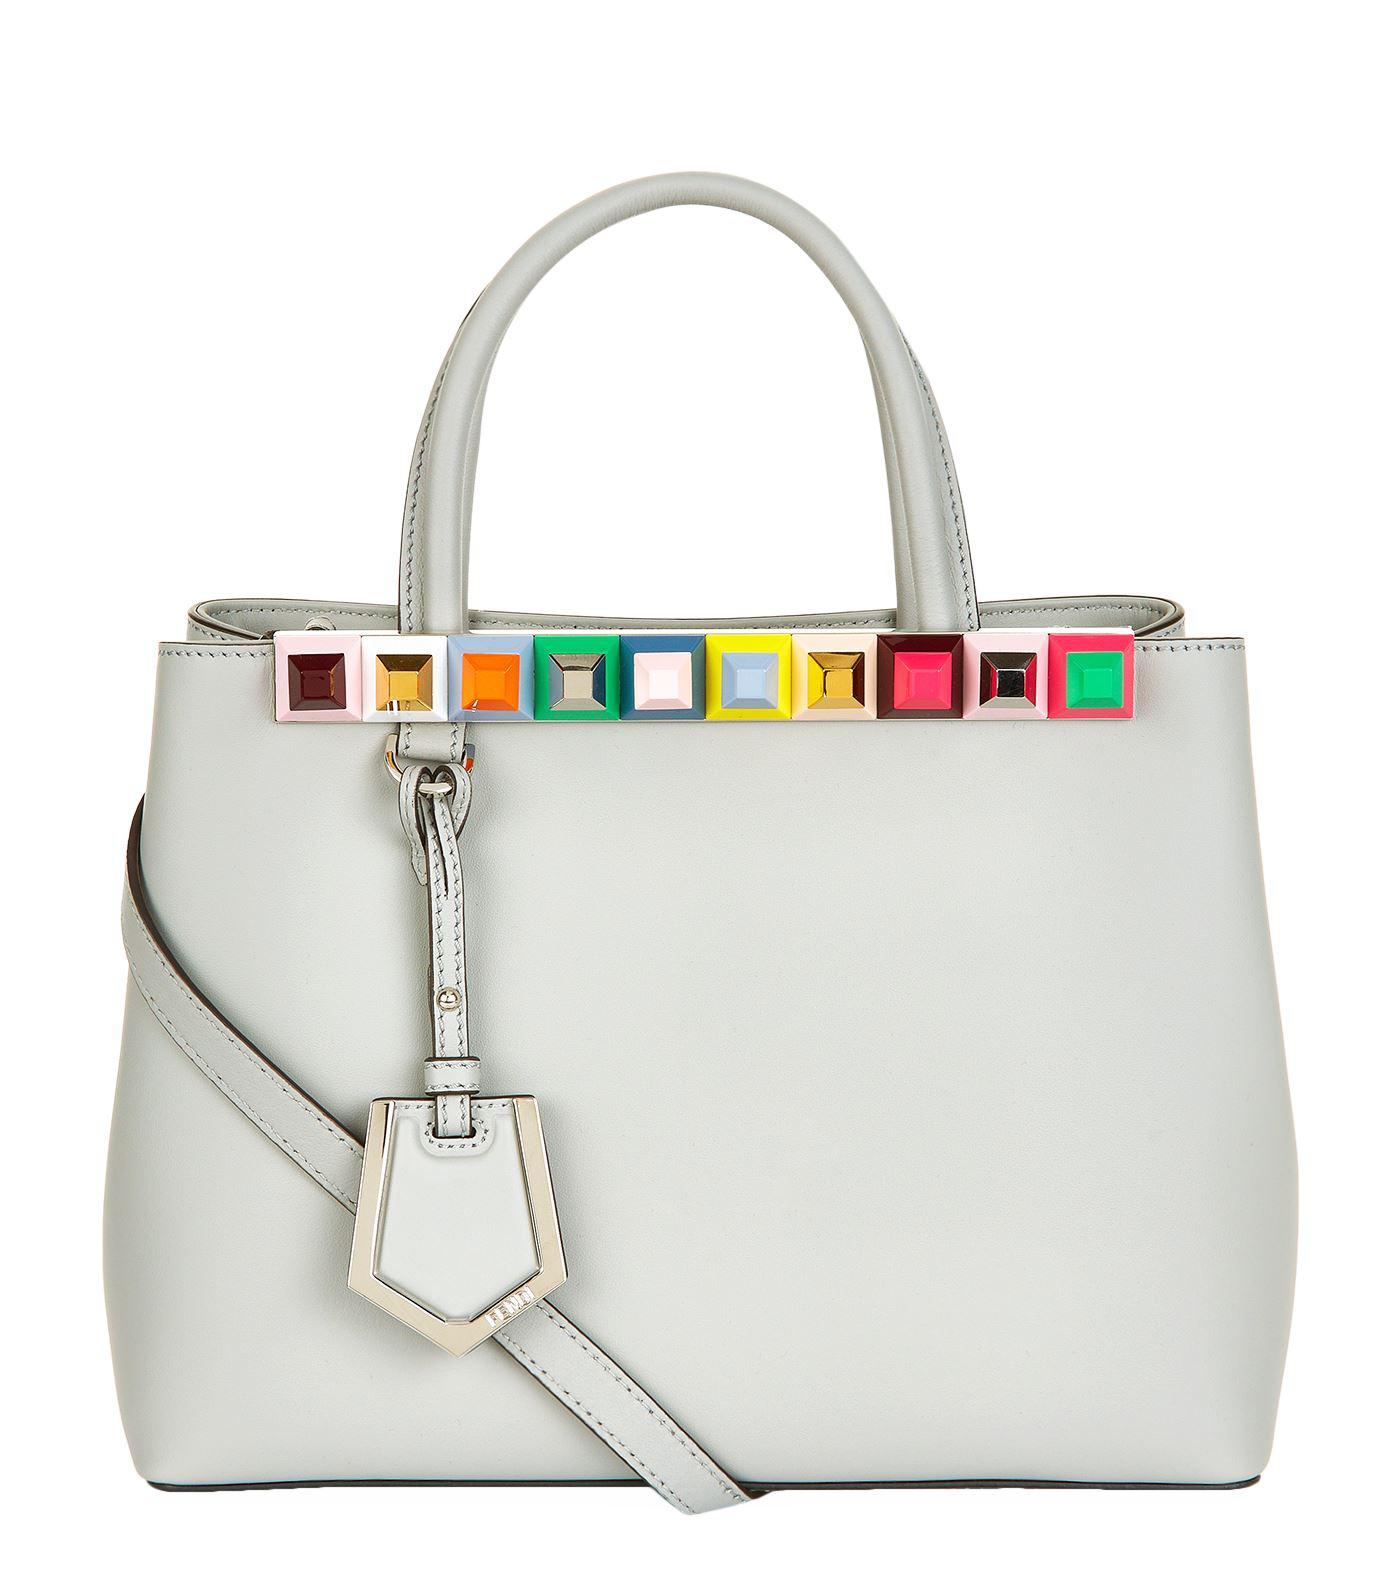 80f66de5668b Lyst - Fendi 2jours Studded Shopper Tote Bag